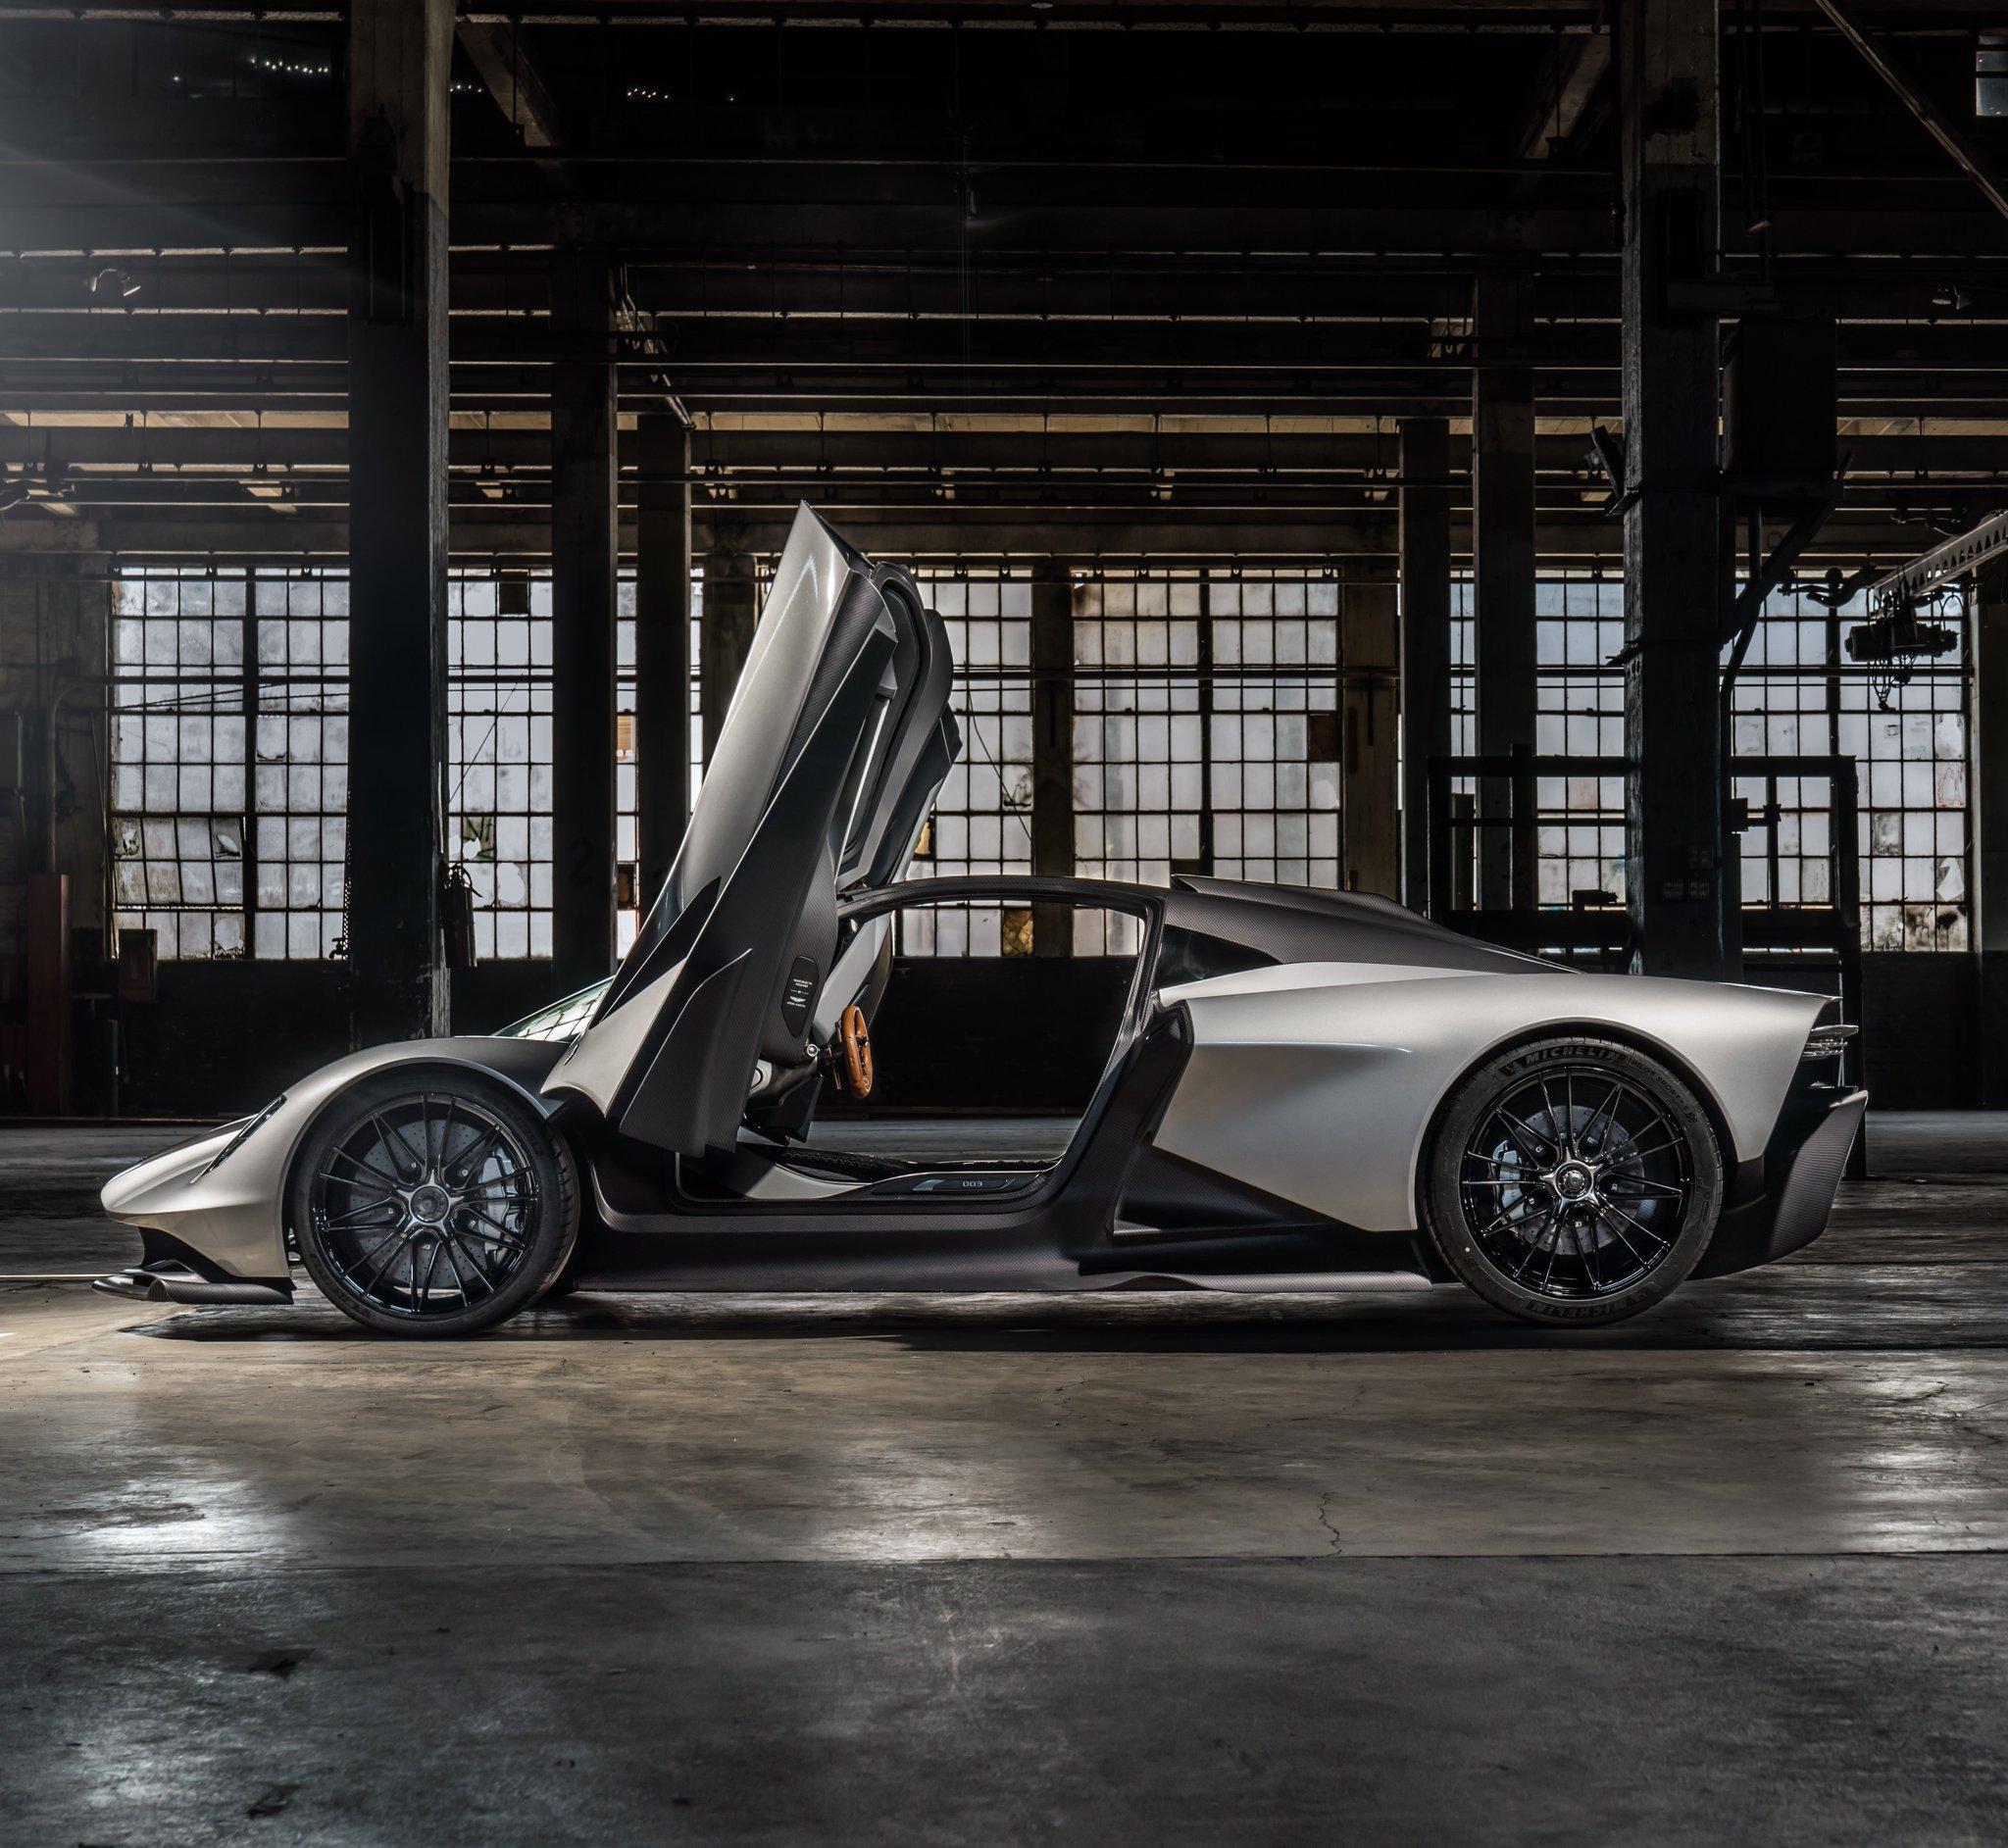 James Bond 25 No Time To Die Cars List Aston Martin 6 Jpeg Watchlounge